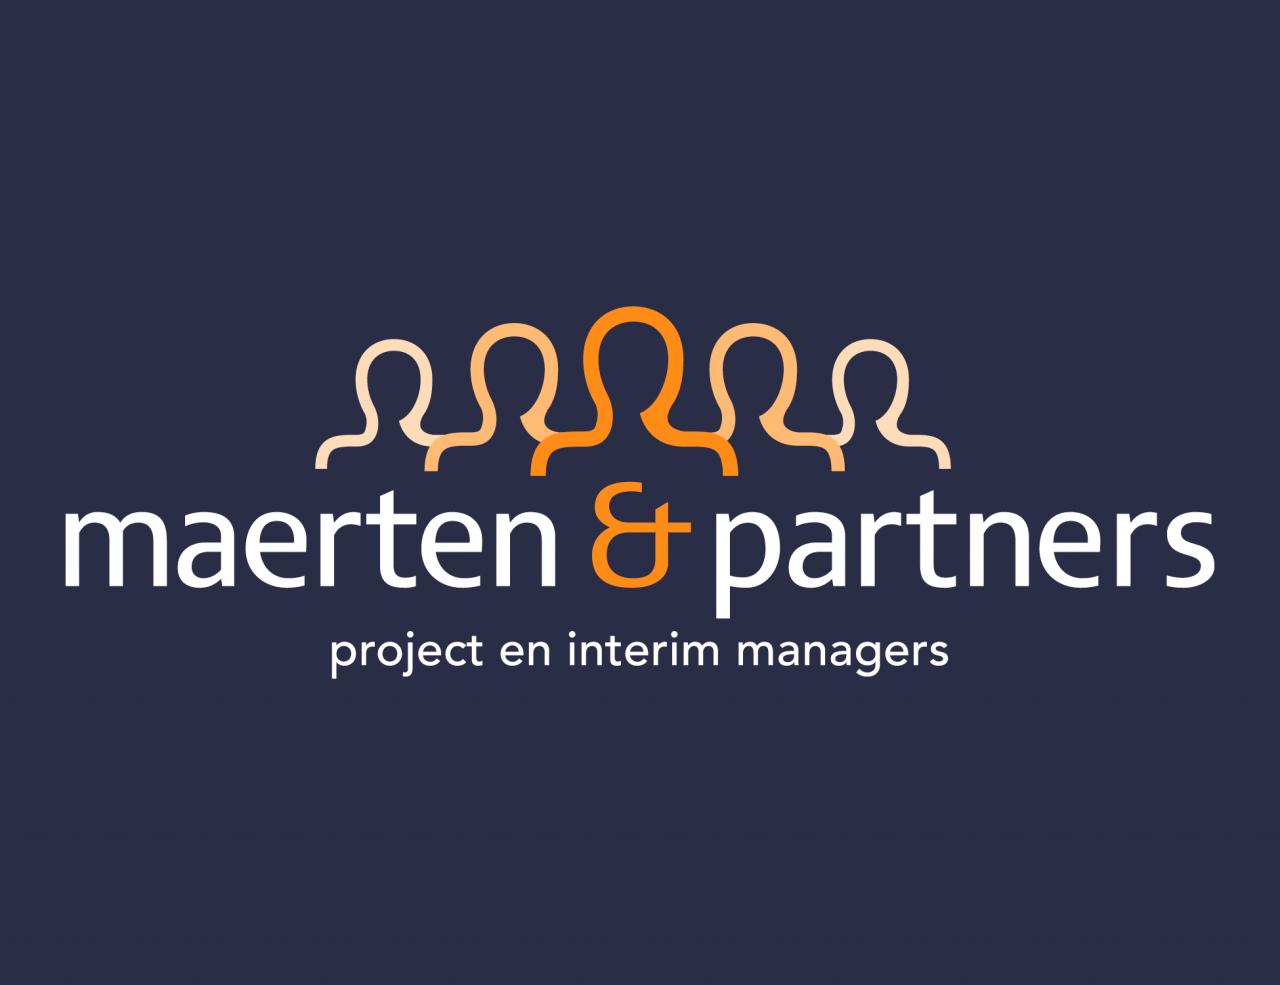 Maerten & partners